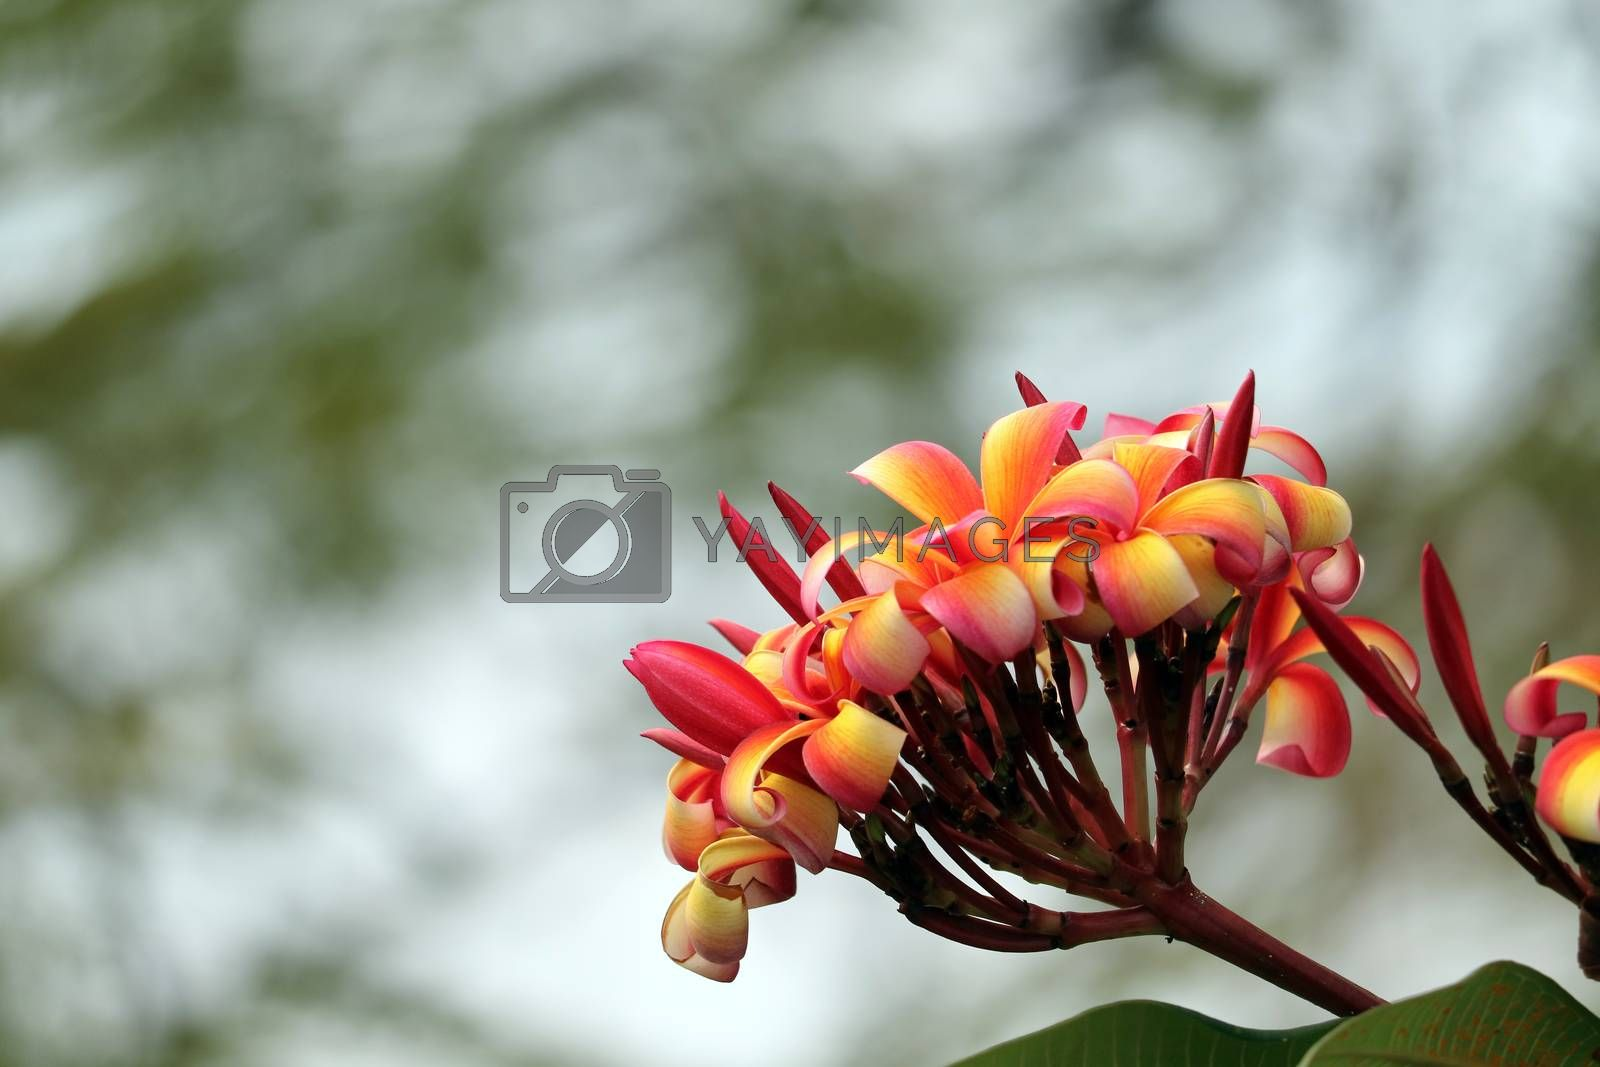 plumeria red white orange yellow bouquet flower blooming in the park blur background